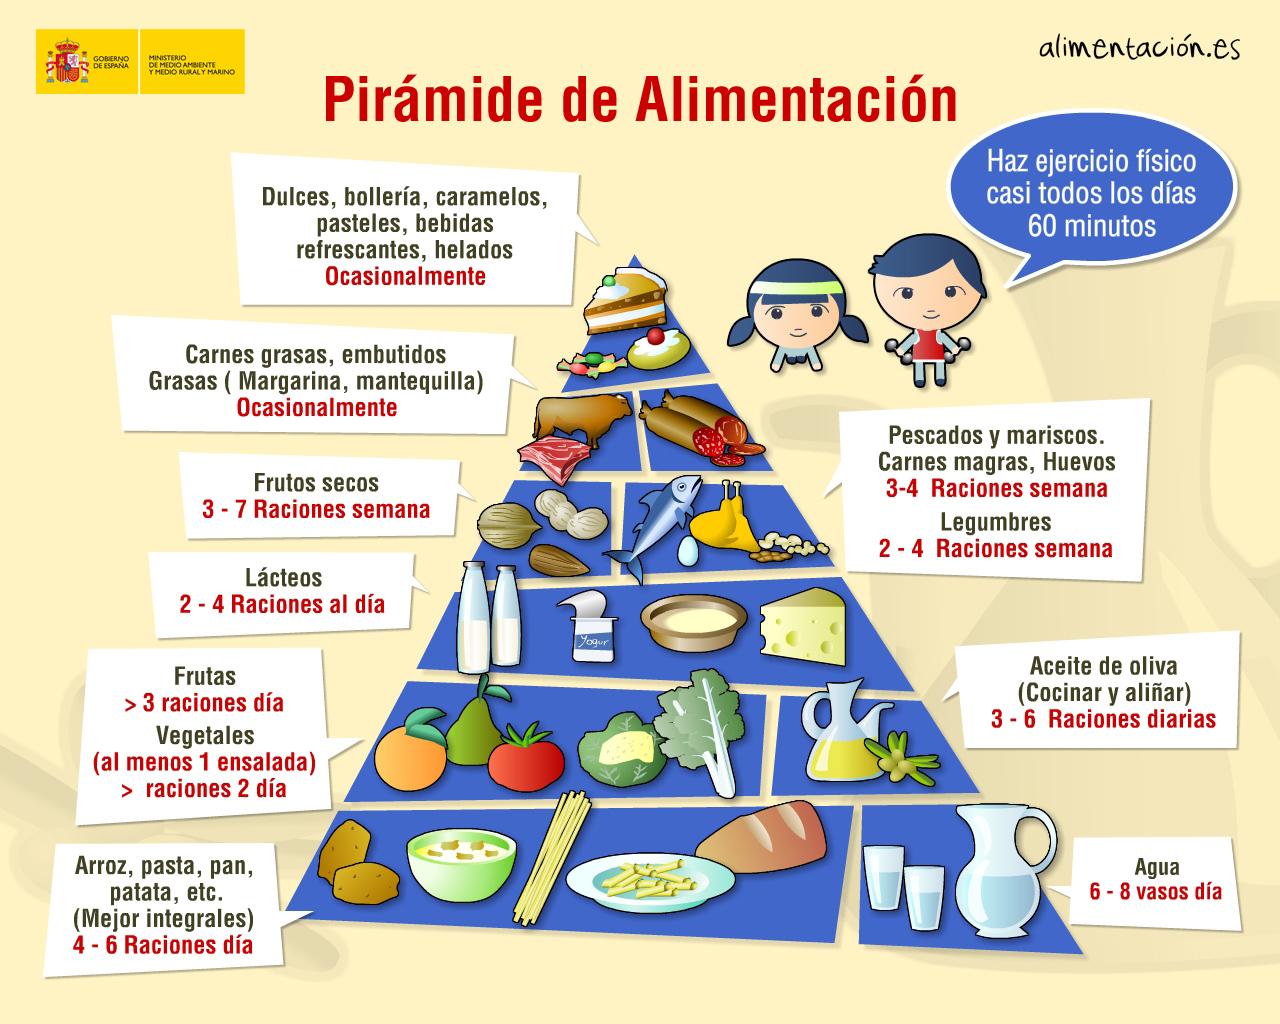 La gu a de nutrici n pir mide alimenticia i - Piramides de alimentos saludables ...